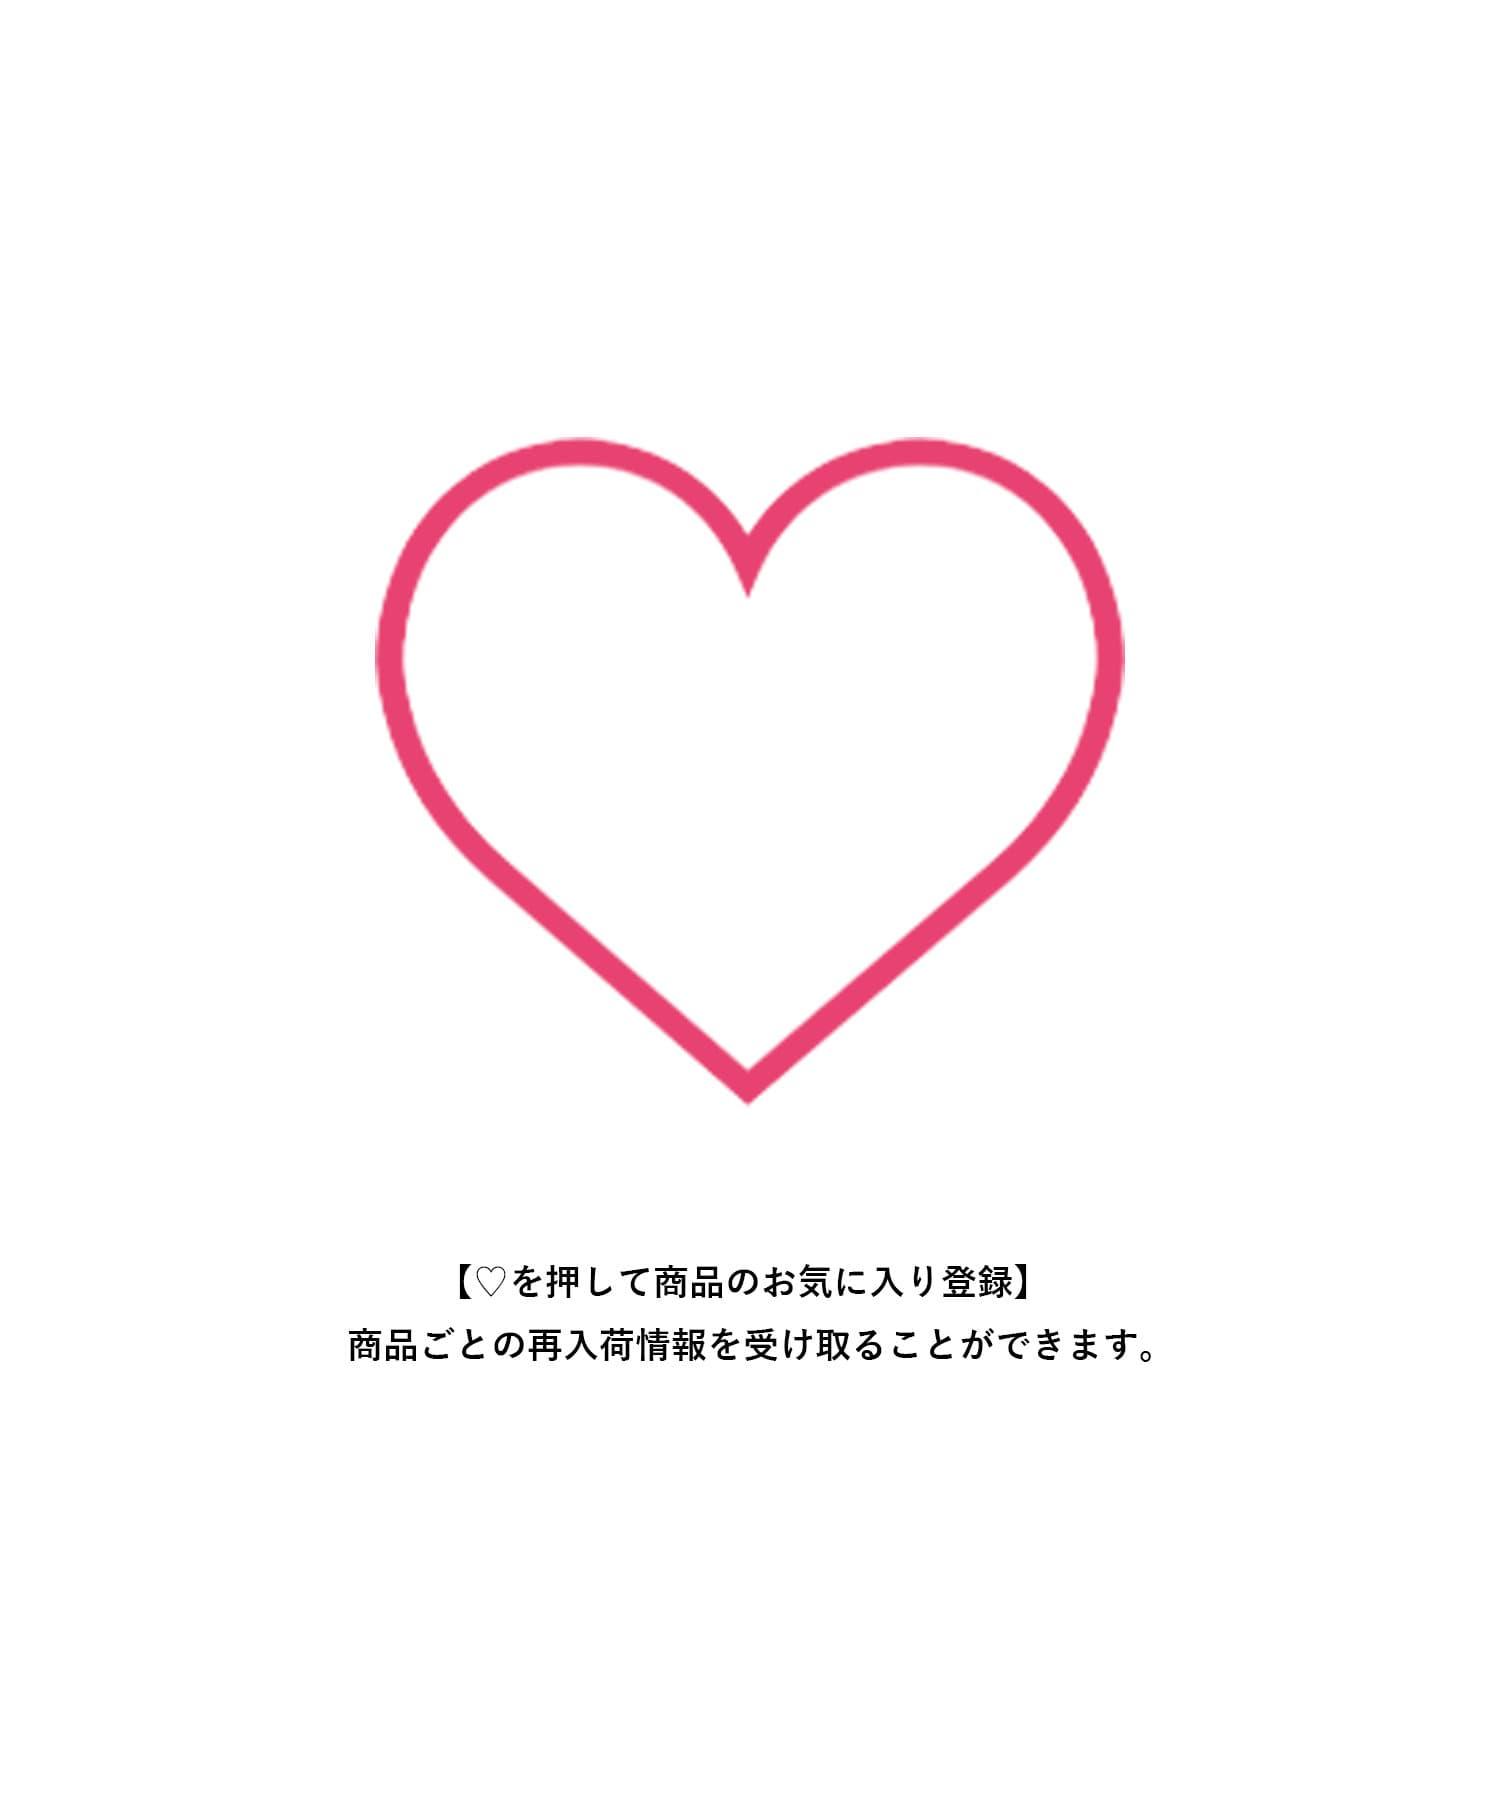 COLLAGE GALLARDAGALANTE(コラージュ ガリャルダガランテ) 【PAPILLONNER】マシュマロタッチガウンルームウェア